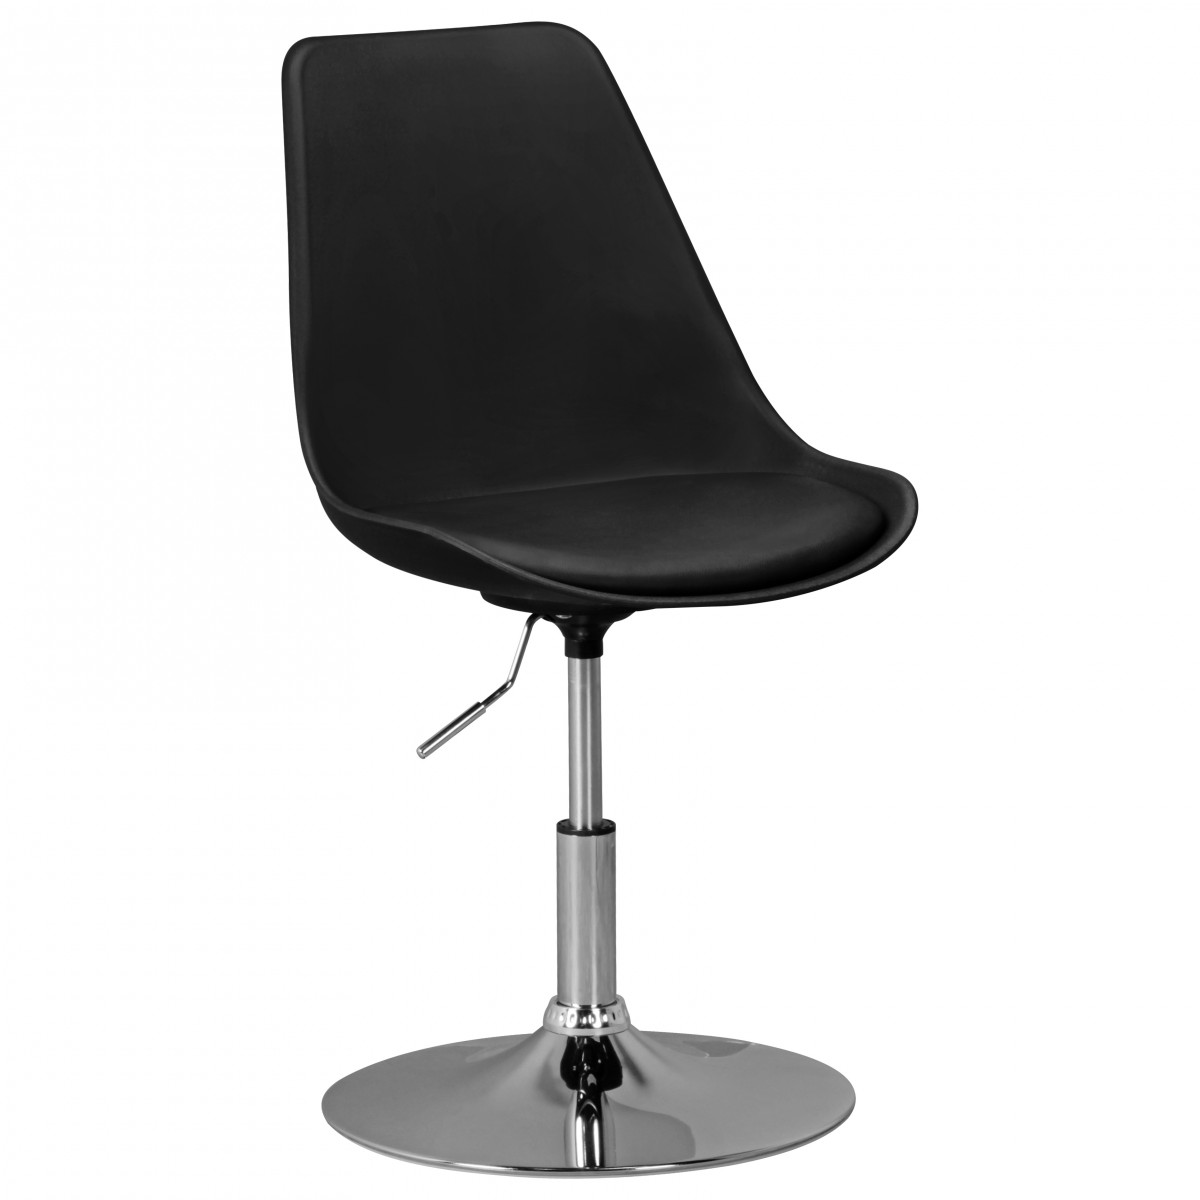 Finebuy hainan si ge tissu chaise pivotante pivotant for Chaise pivotante